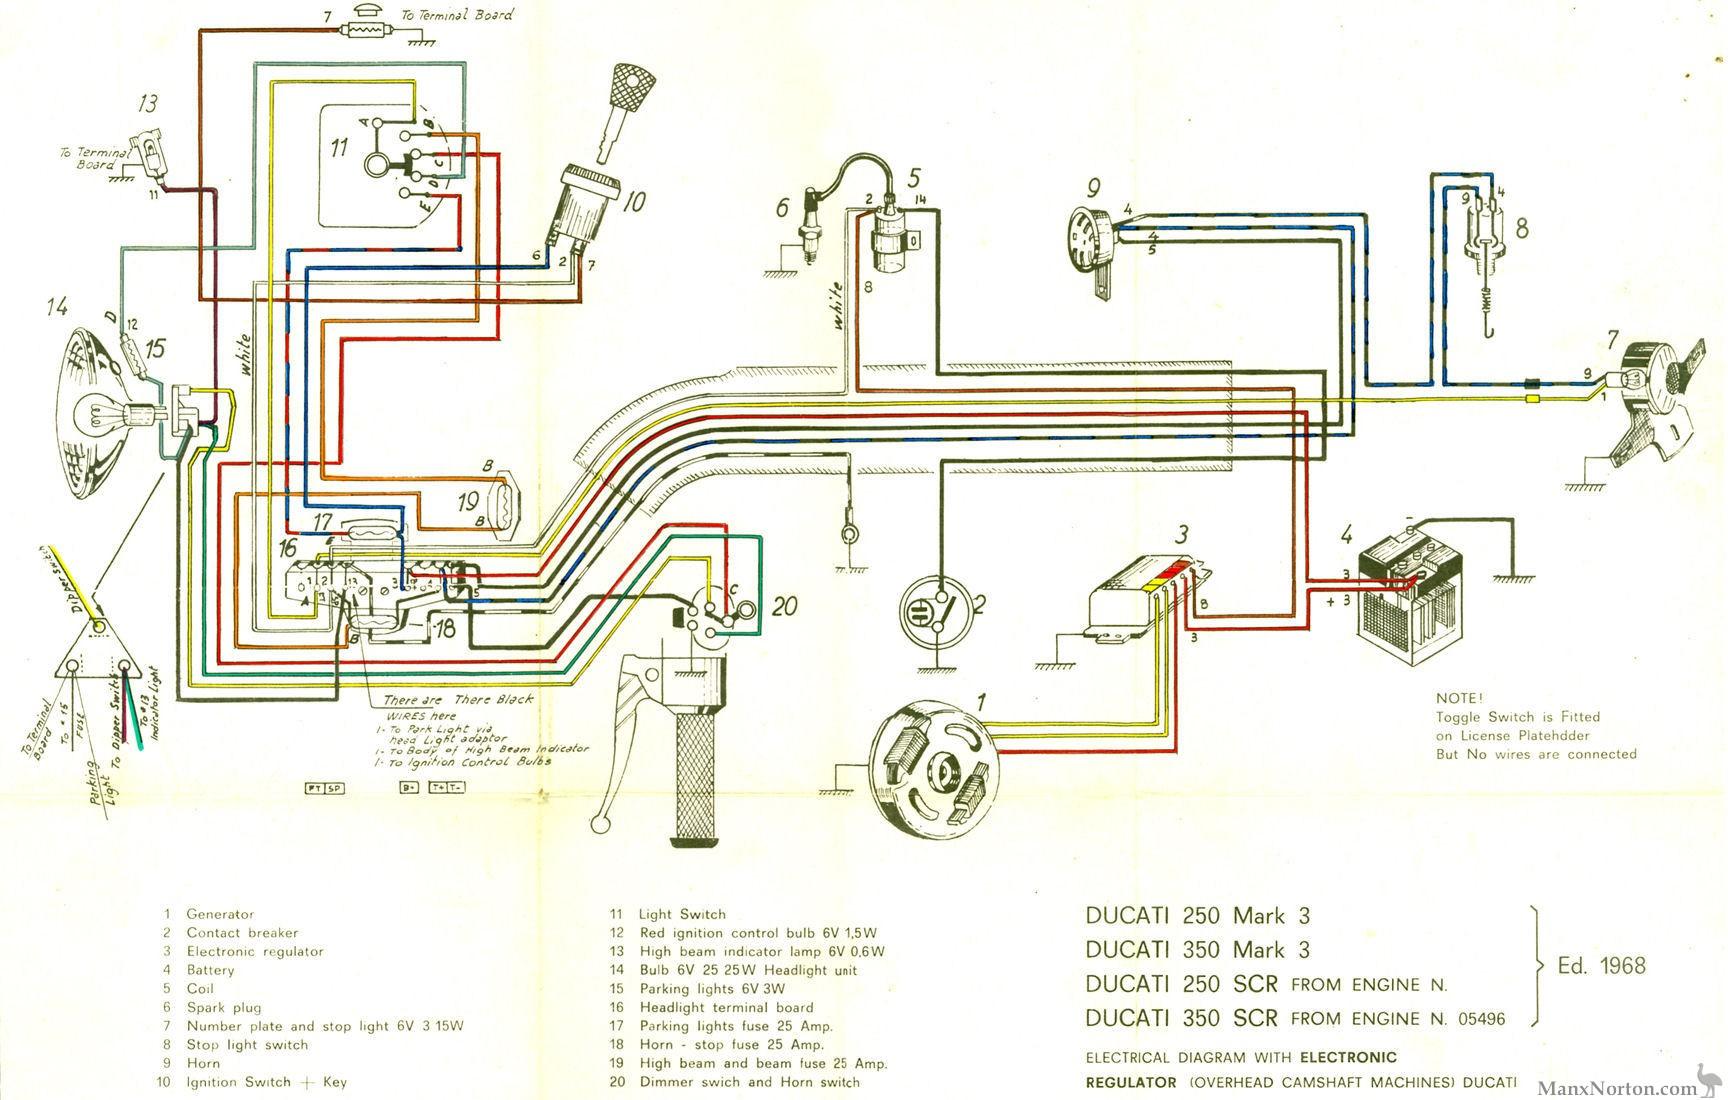 ducati monster 821 service manual pdf